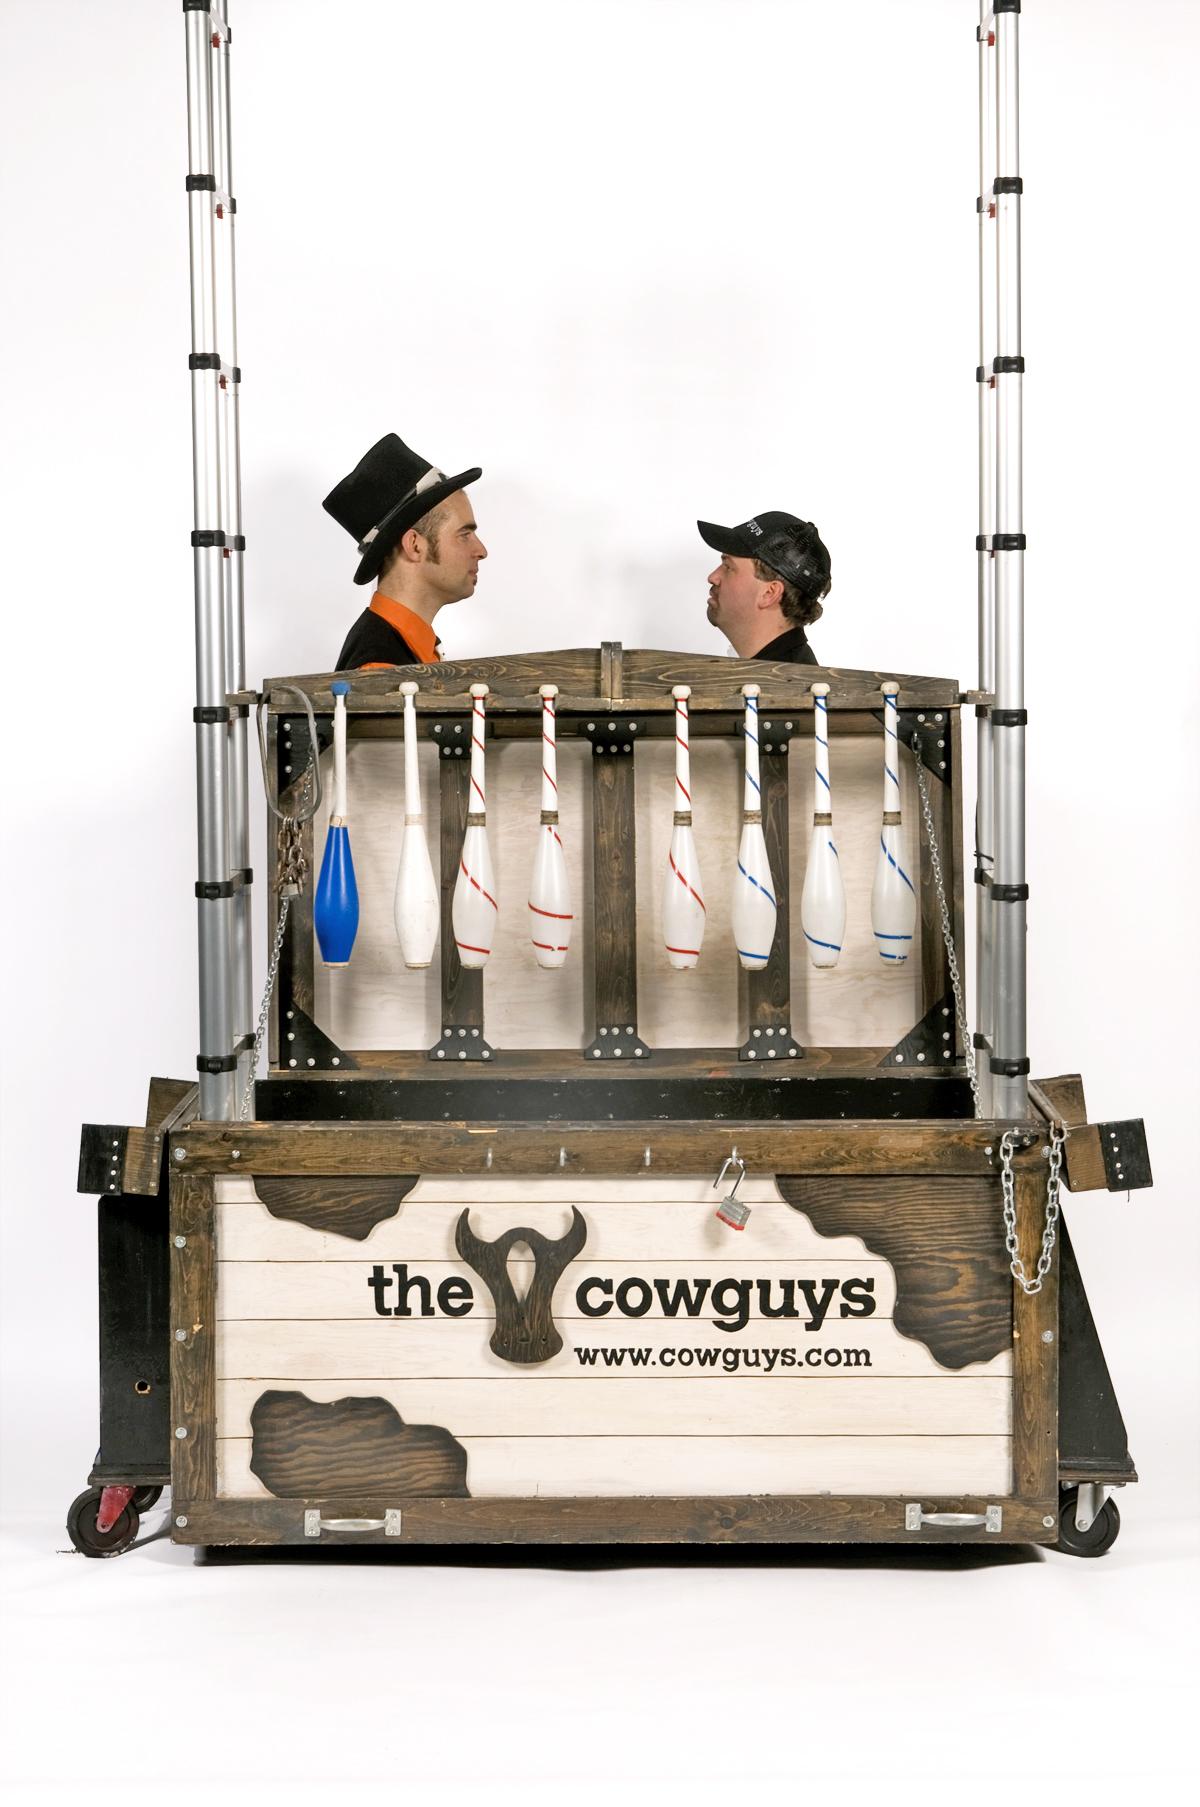 Cowguyspromo2bigshowset